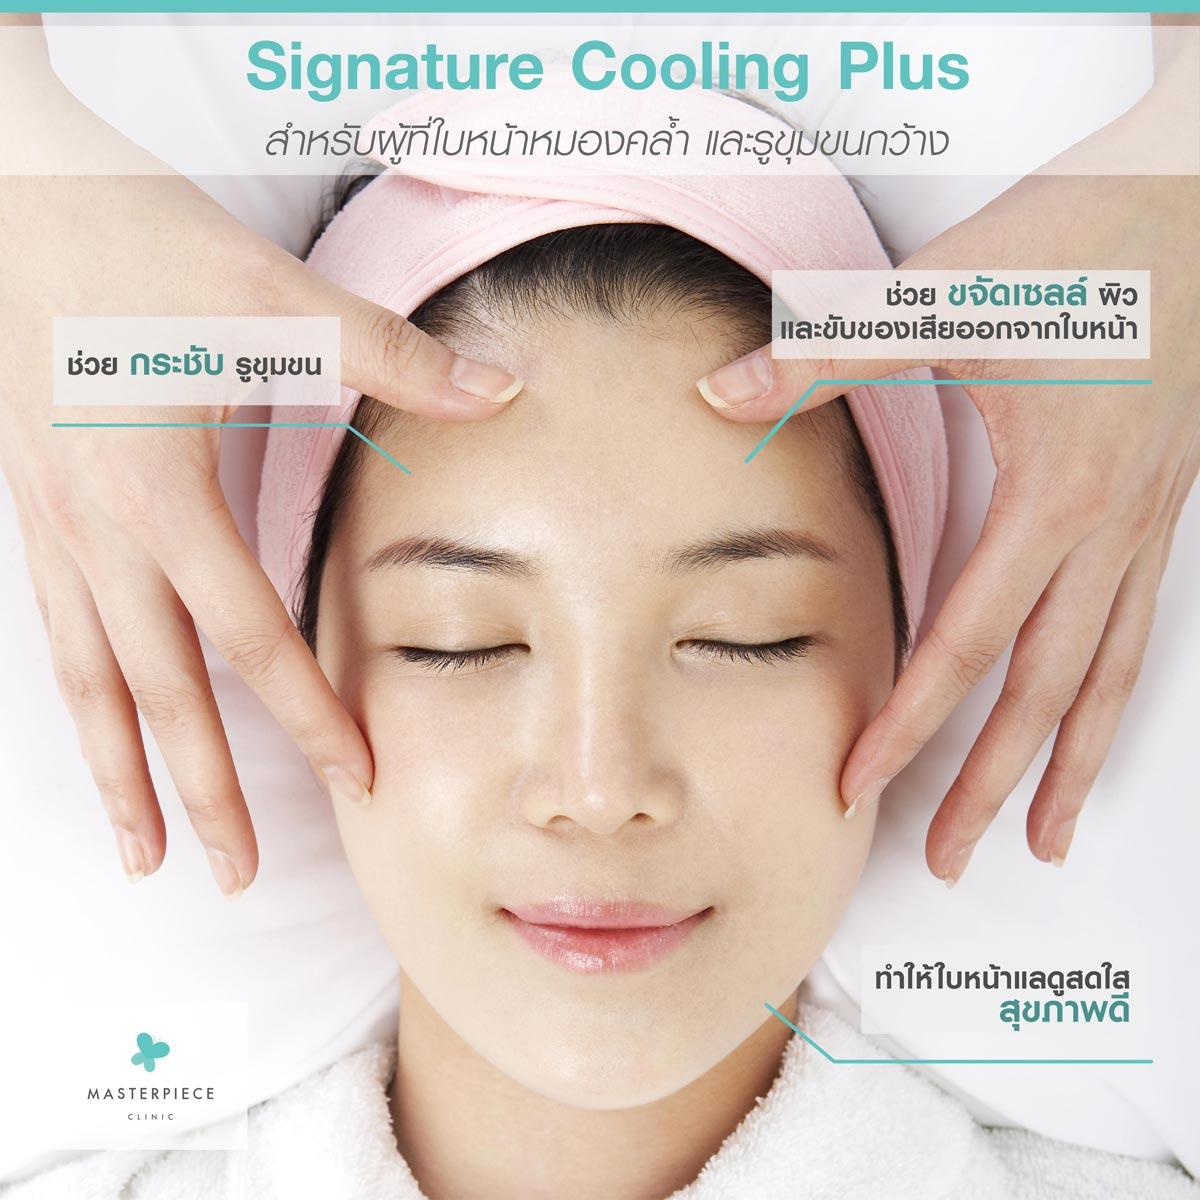 Signature Cooling Plus นวดกระชับรูขุมขน